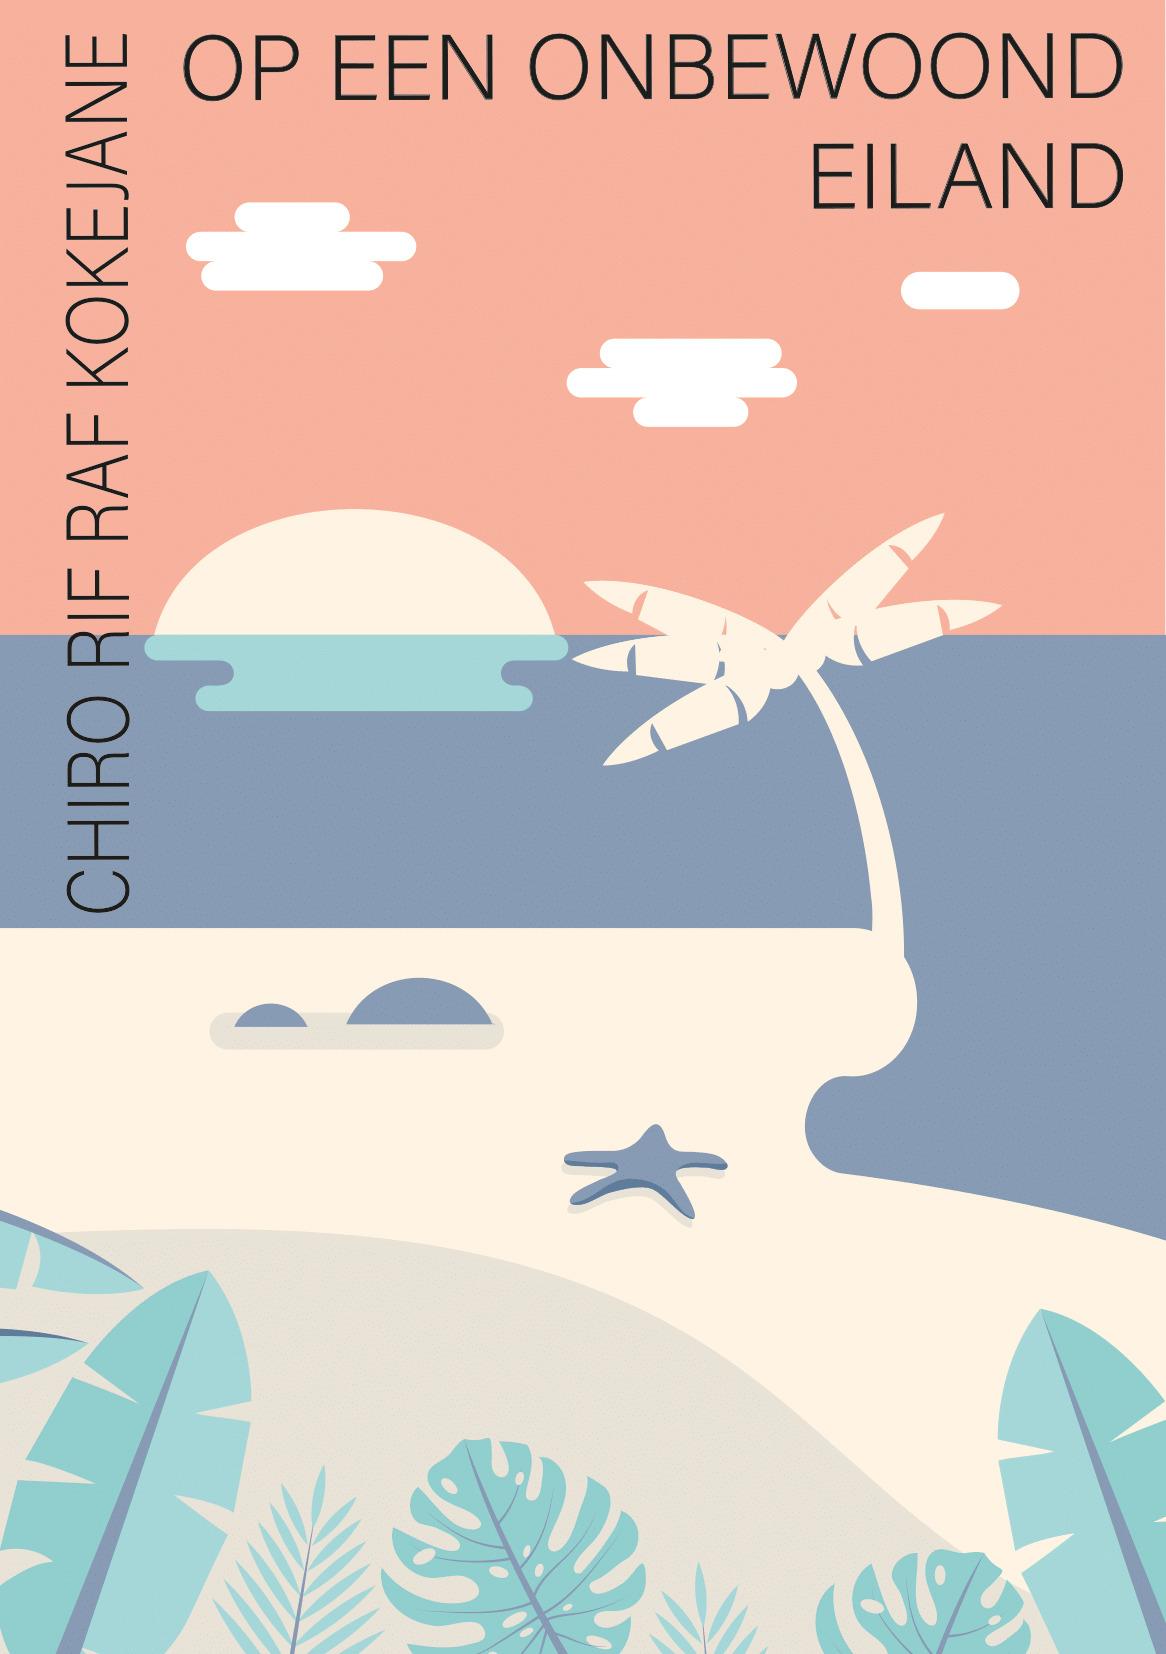 Op een onbewoond eiland Kamp Koekelare 2021 Chiro Rif-Raf Kokejane